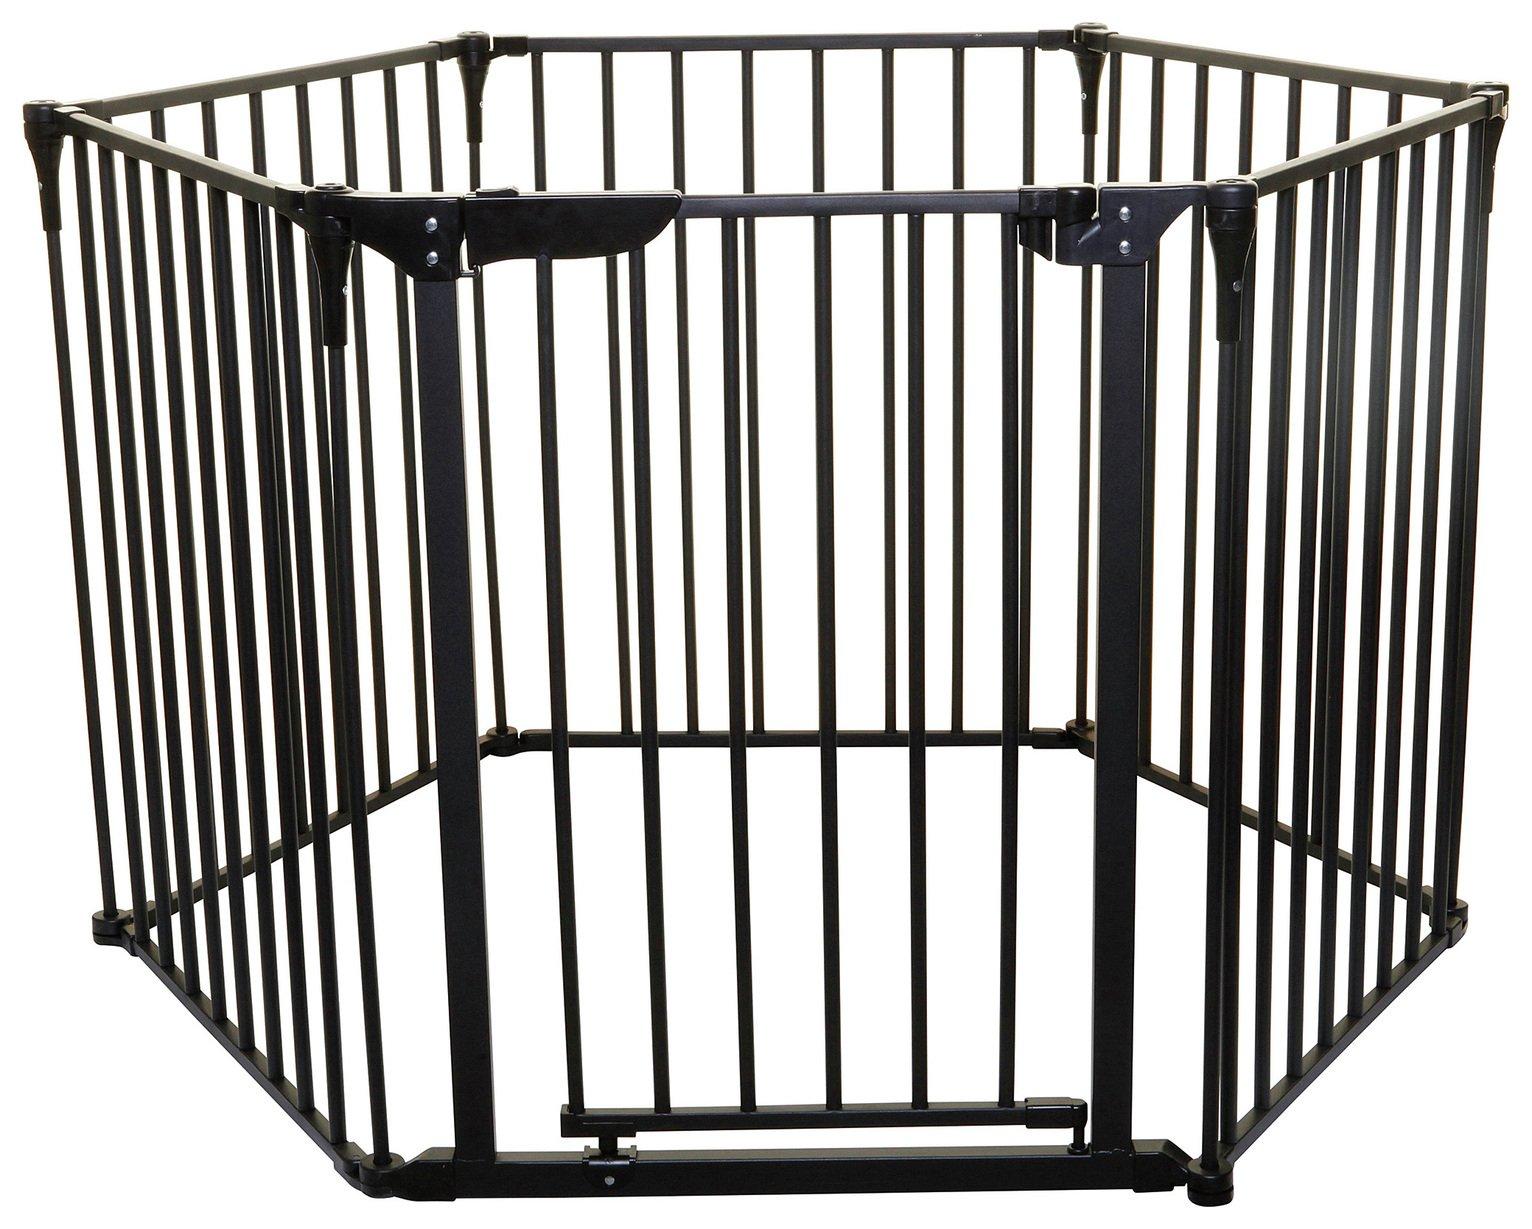 Image of Dreambaby Royale Converta 3-in-1 Playpen Gate - Black